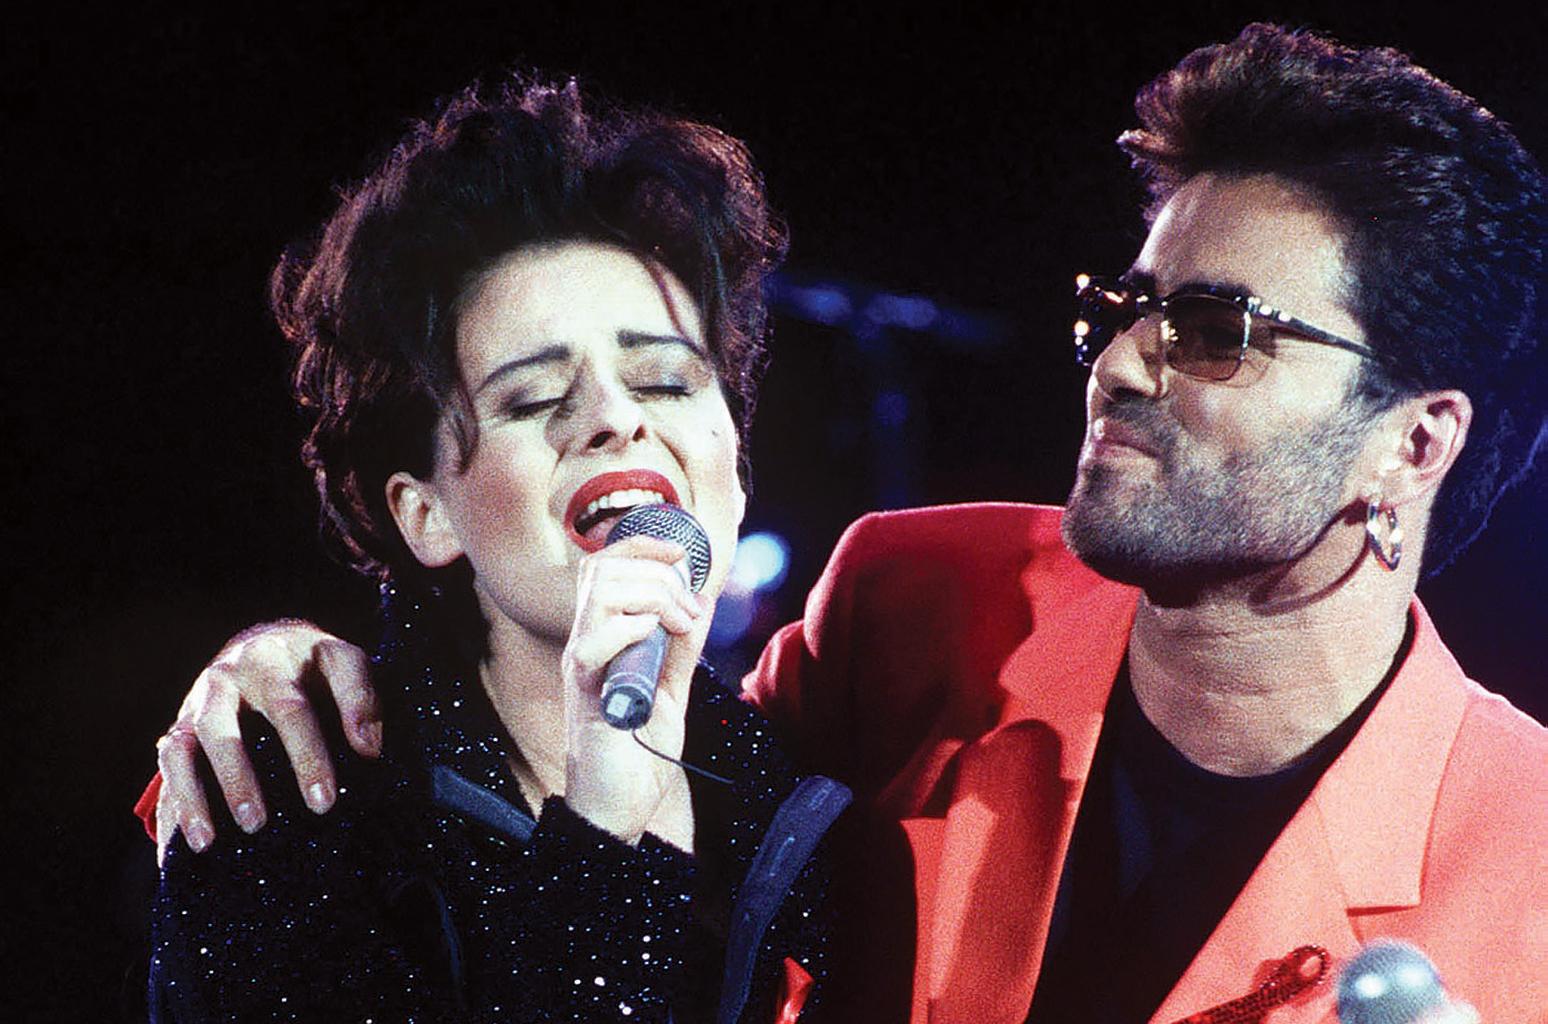 Remembering George Michael: Lisa Stansfield Shares Memories of Singing With Him at Freddie Mercury Tribute Concert   Billboard